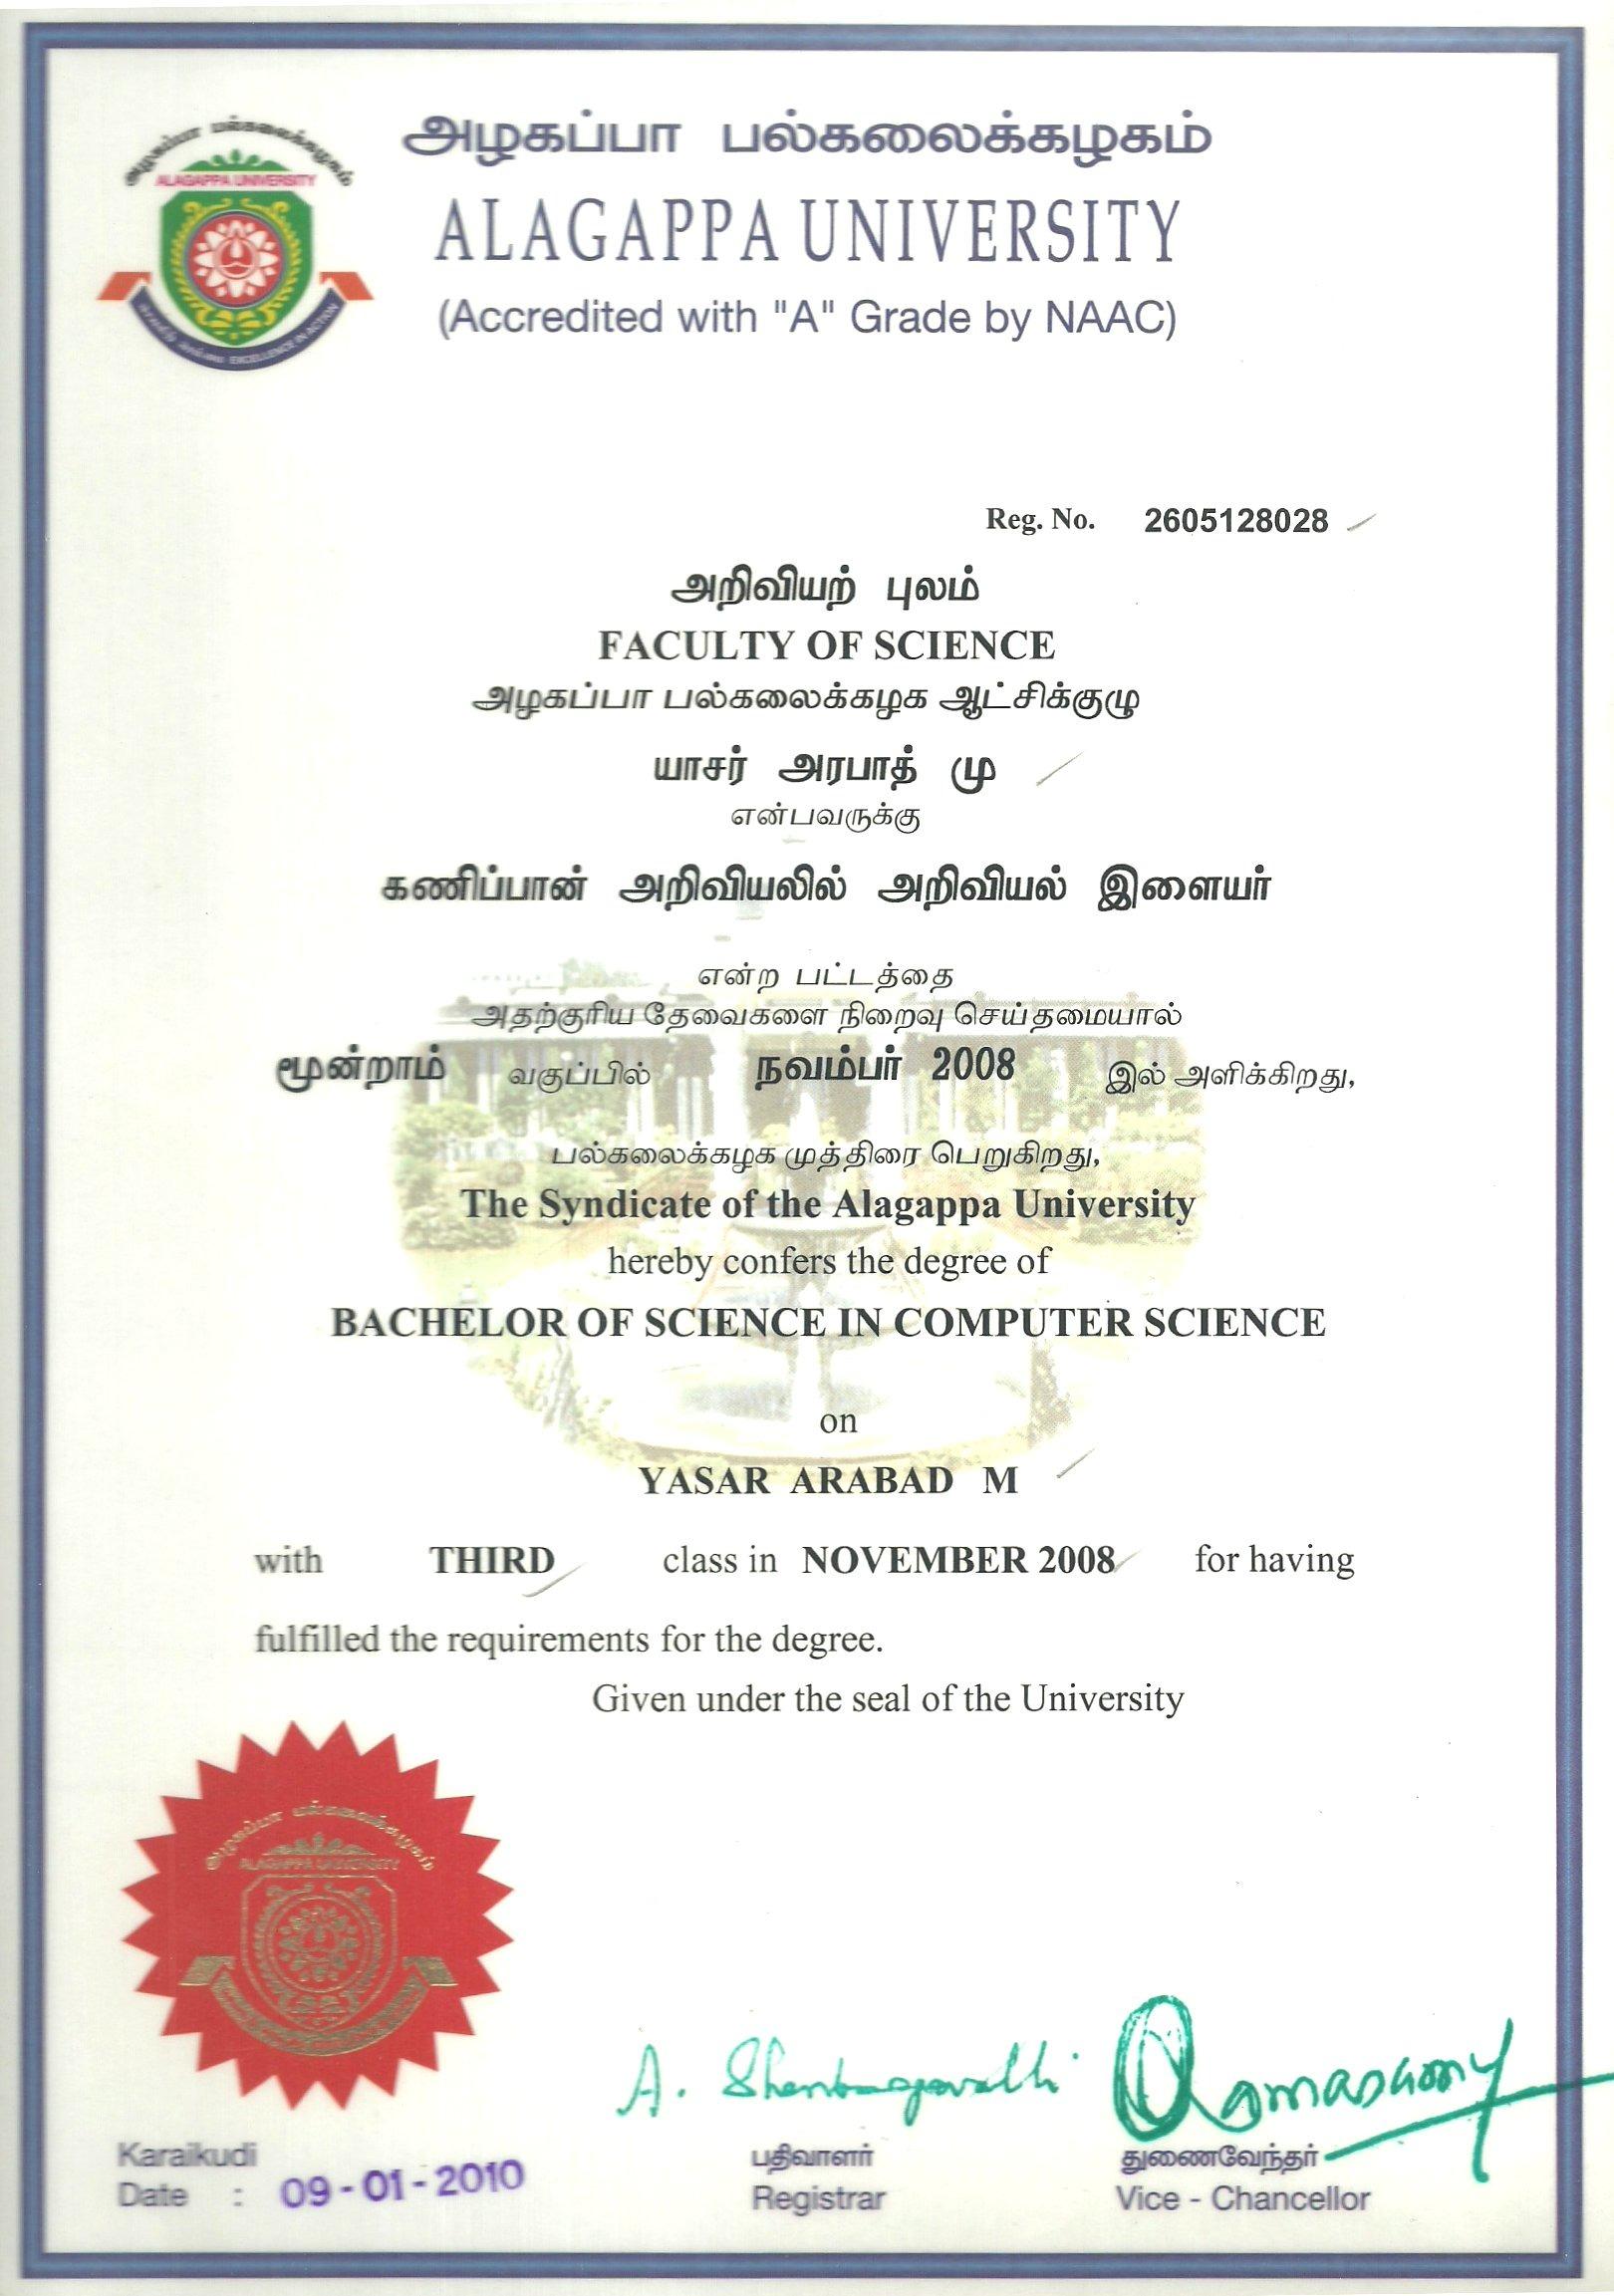 Yasar arabad bayt bachelors degree bsc computer science 1betcityfo Images